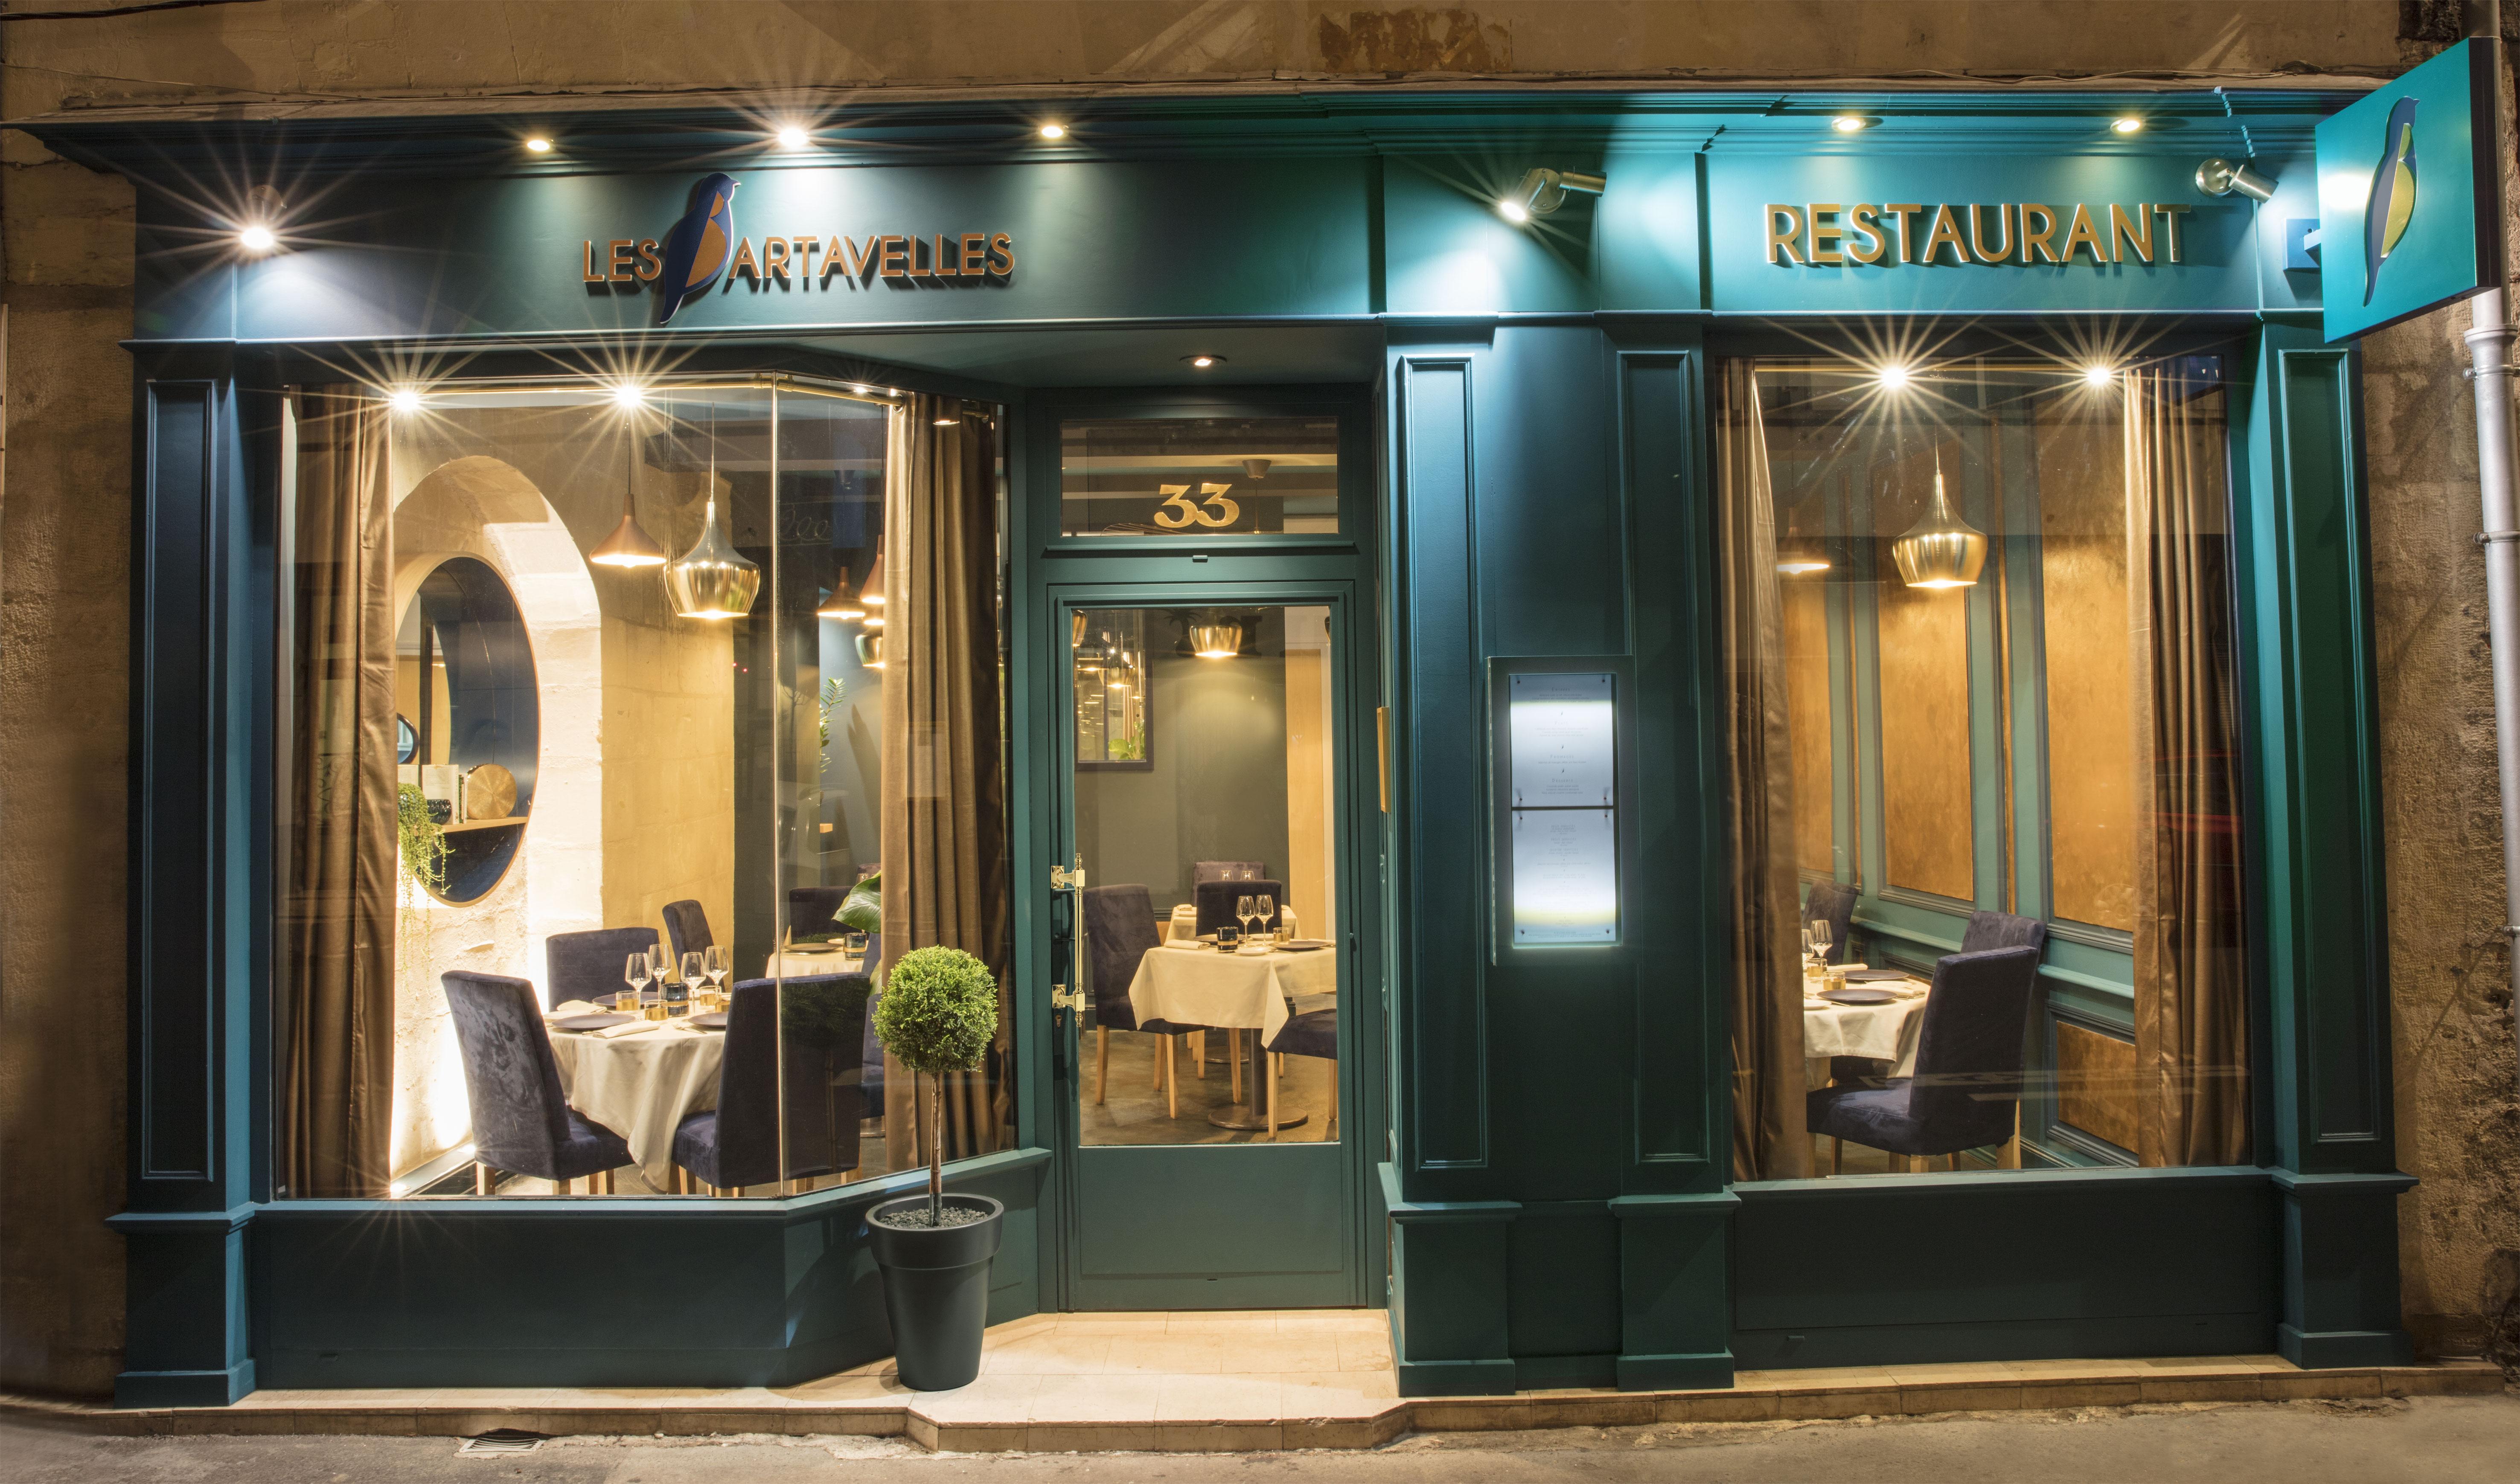 Les Bartavelles - Restaurant